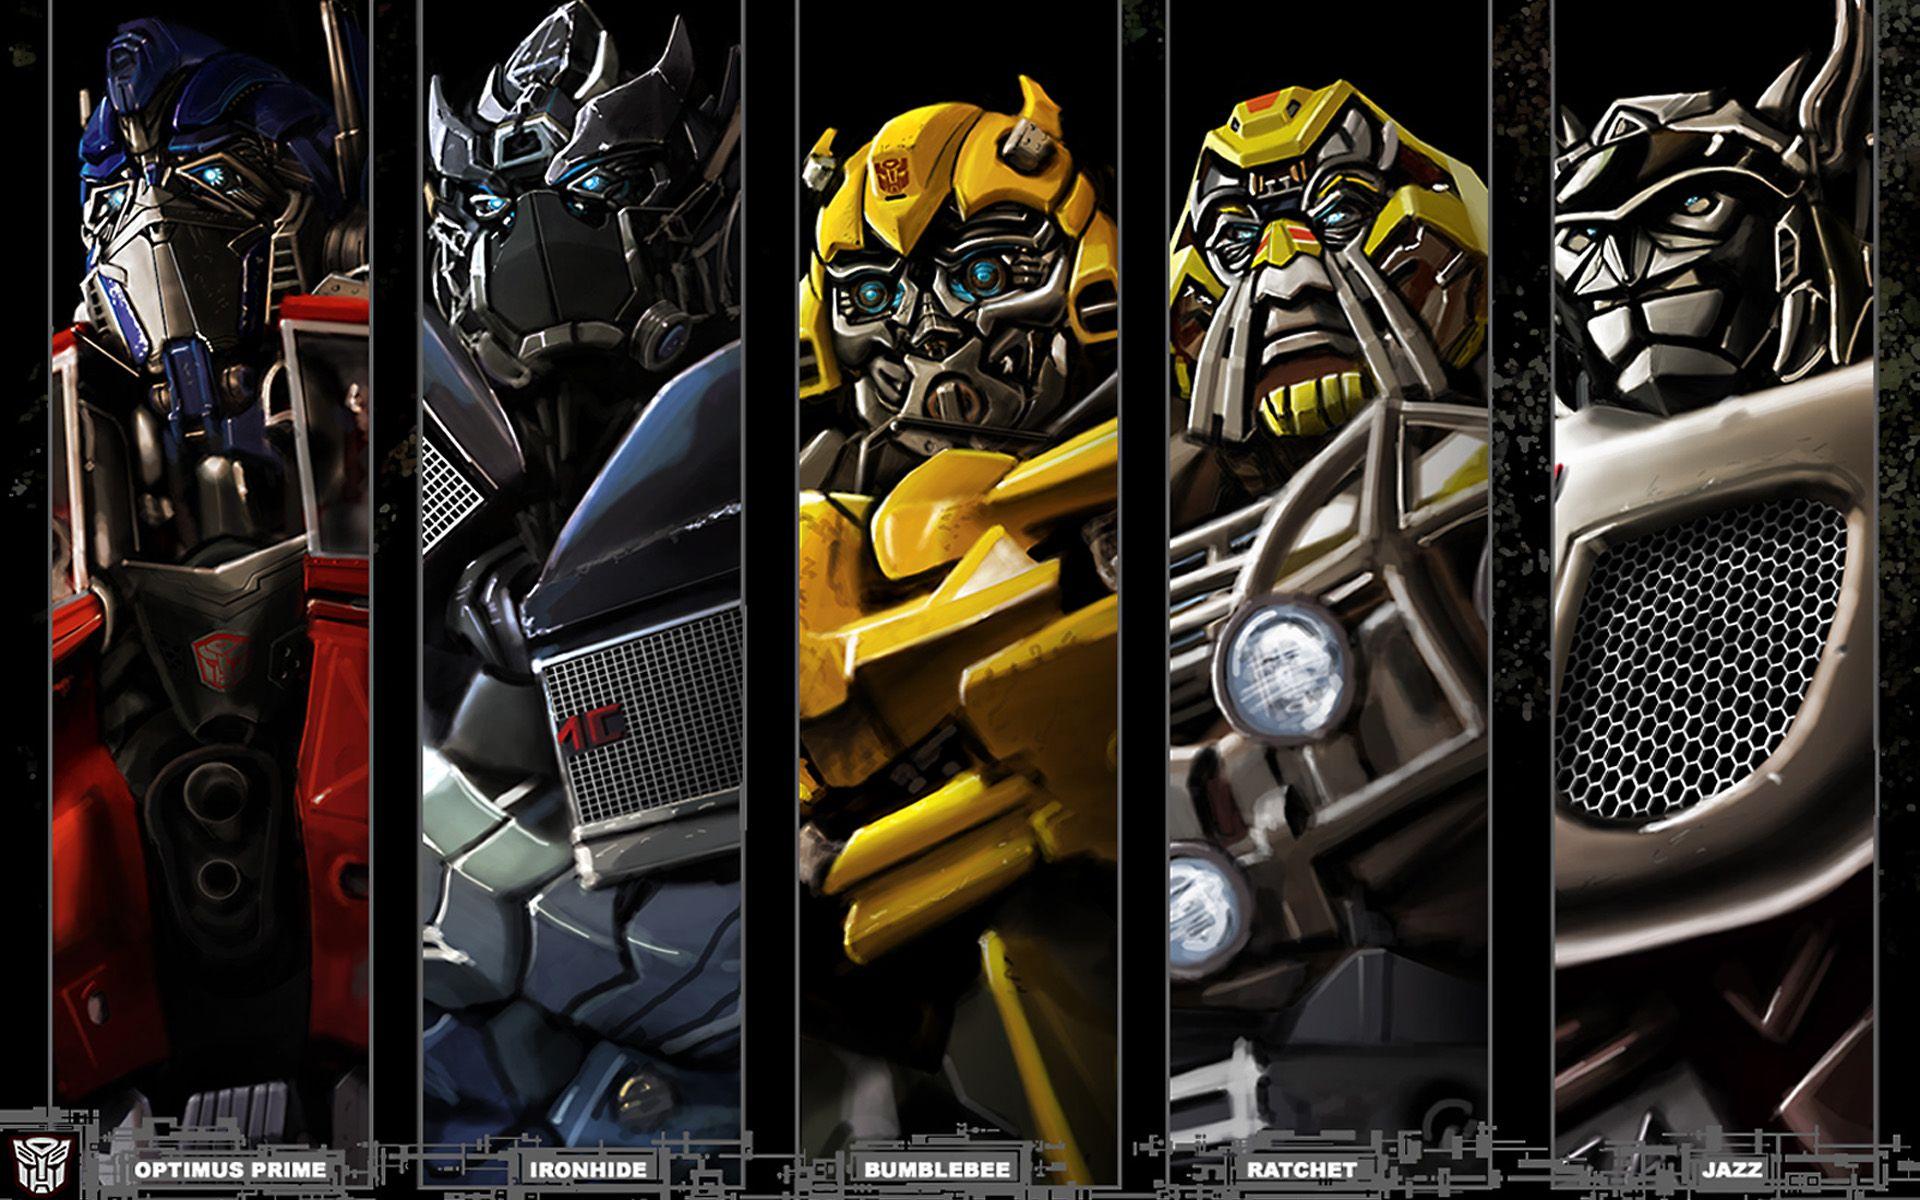 Cool Transformers Wallpapers | ... , wallpaper, trailer, freewallpapers, movie, transformer ...